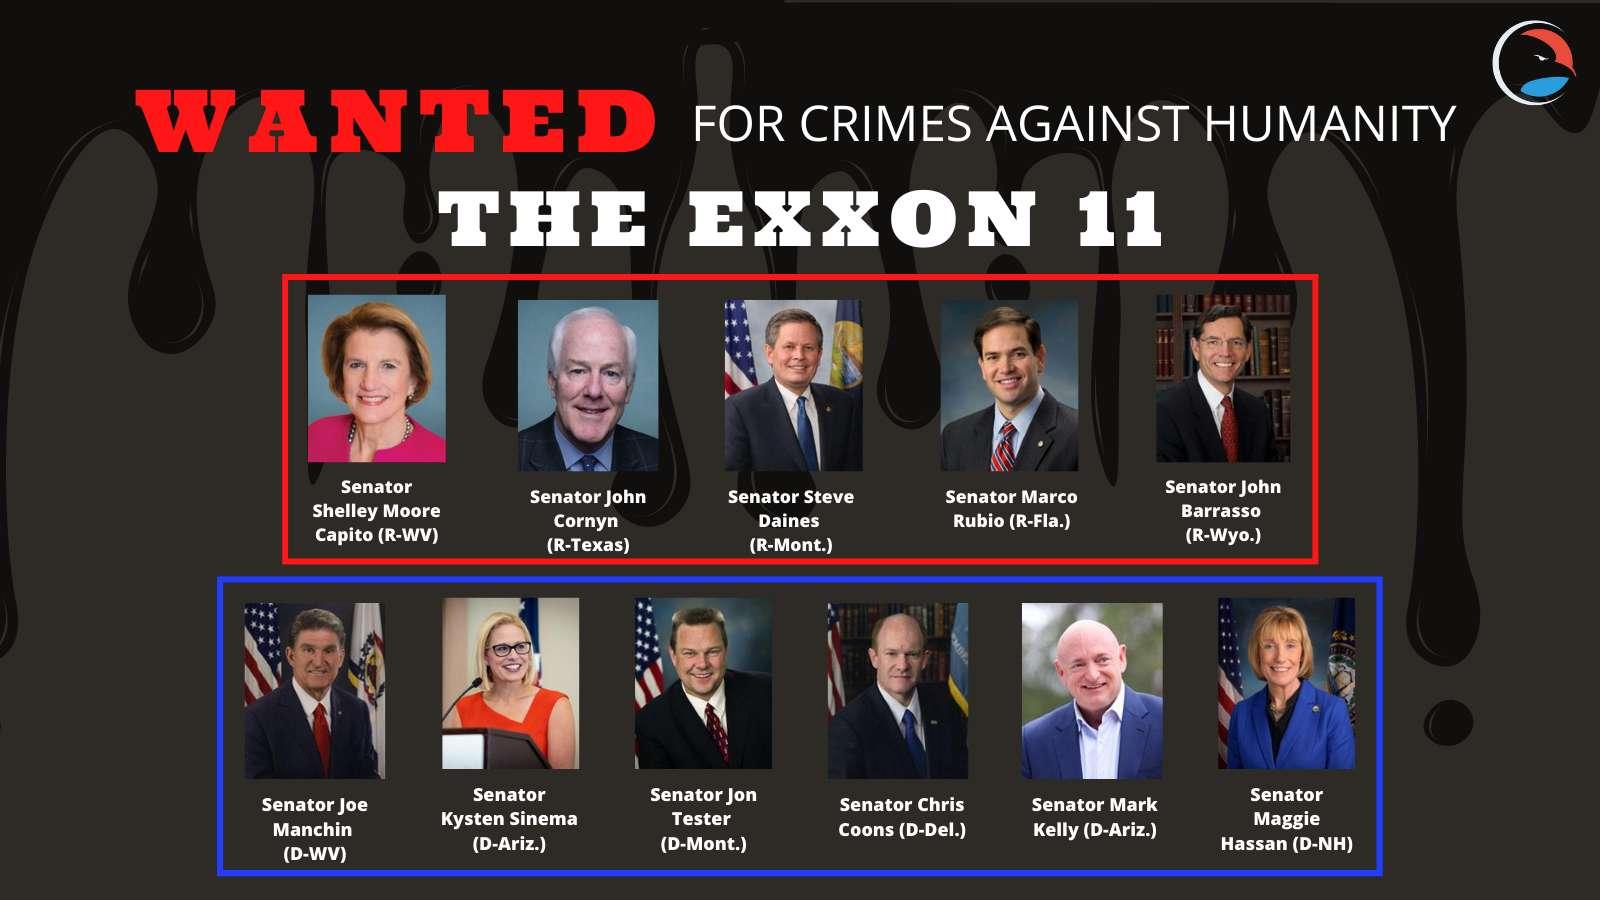 Wanted for crimes against humanity-The Exon 11 -- 11 Democratic and Republican U.S. Senators